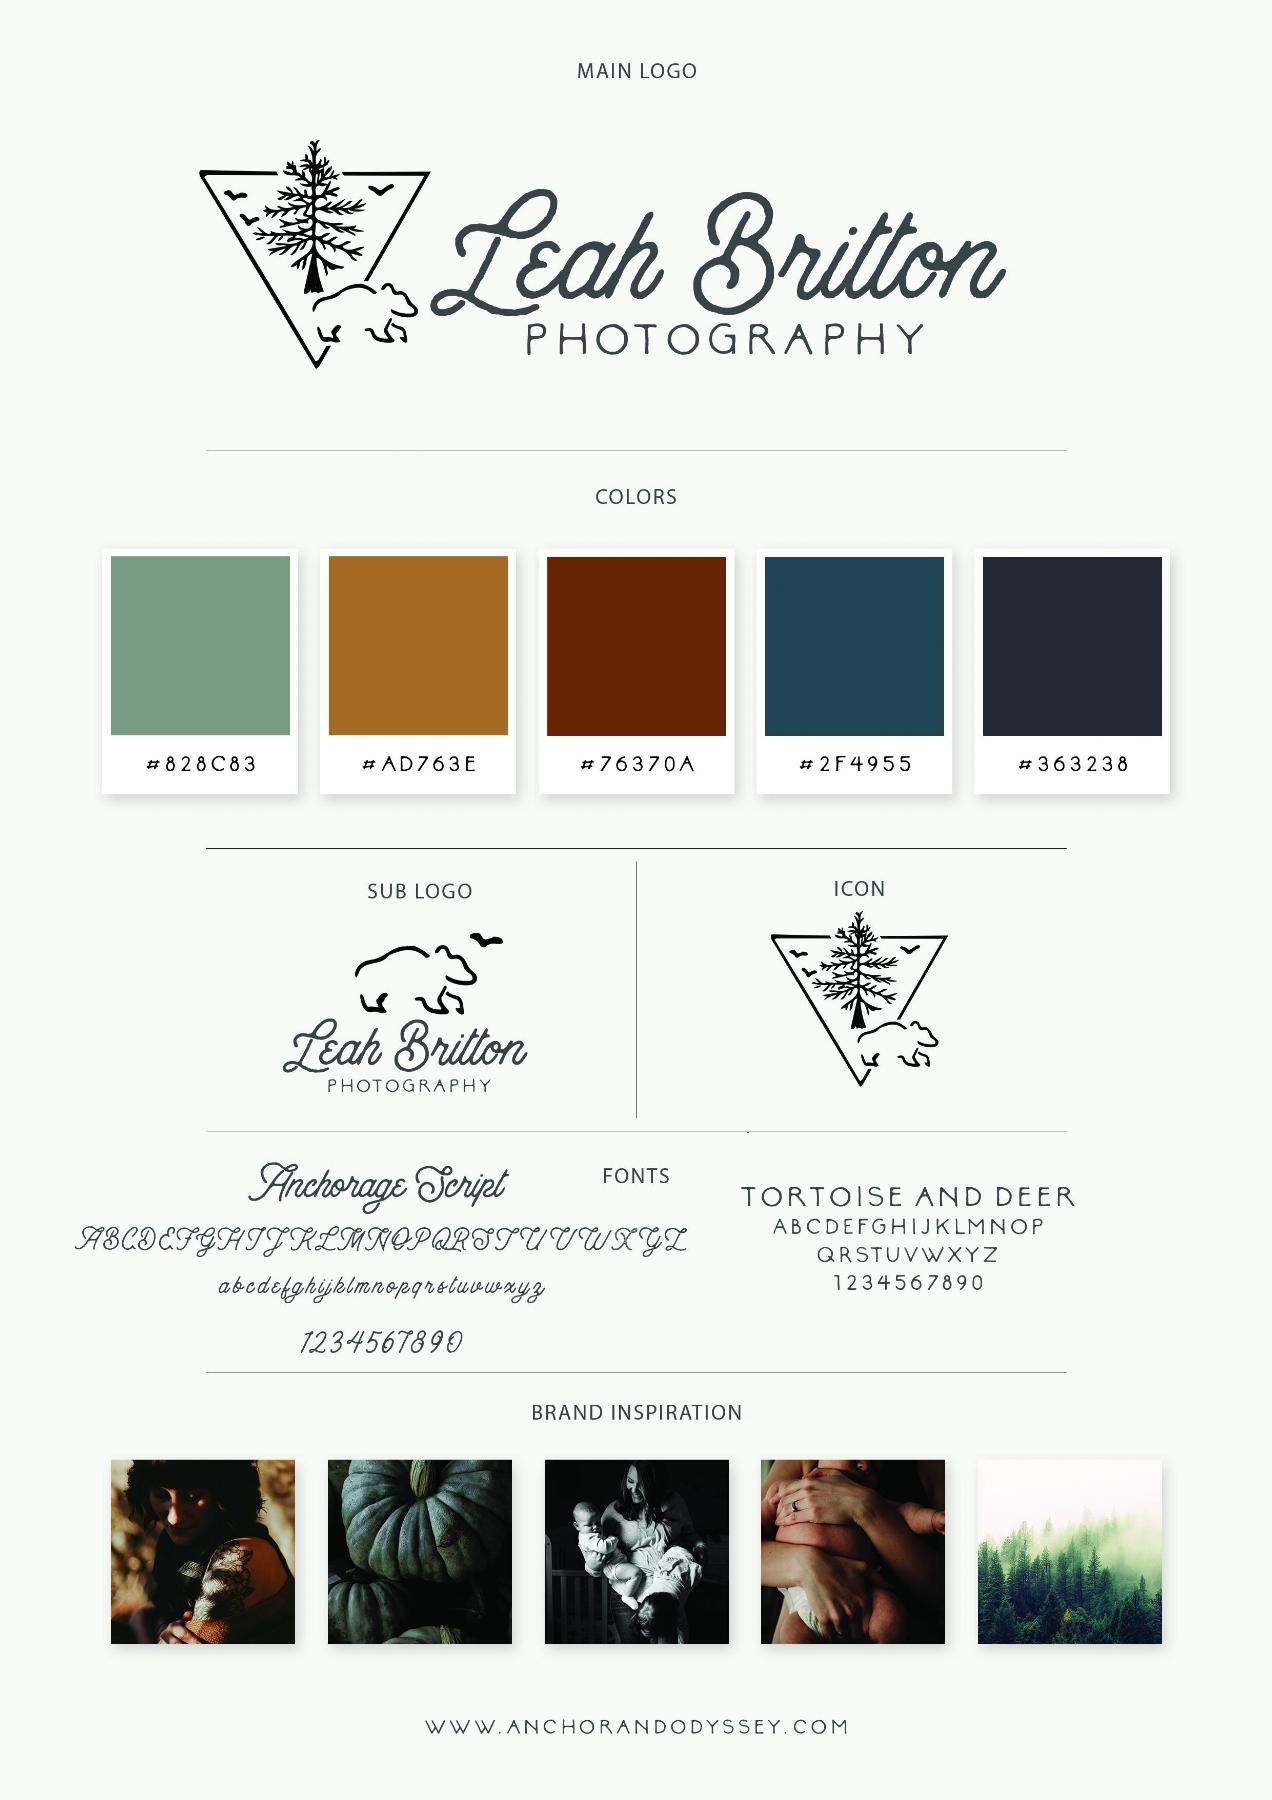 Leah Britton Photography Brand Board.jpg